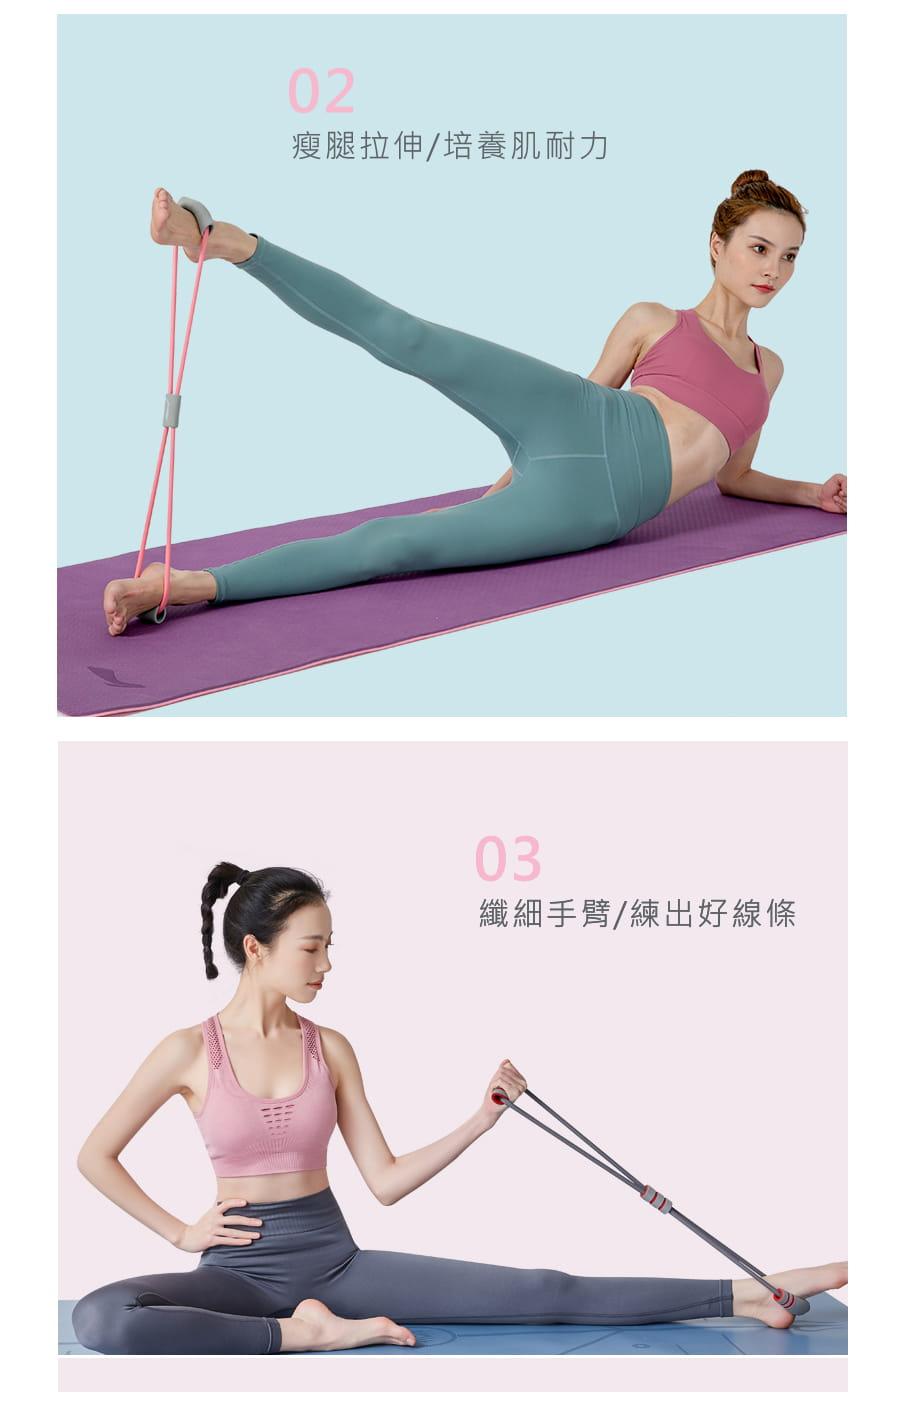 【Un-Sport高機能】Fitness Kit女力健身超值套組(8字拉力帶+瑜珈環) 2